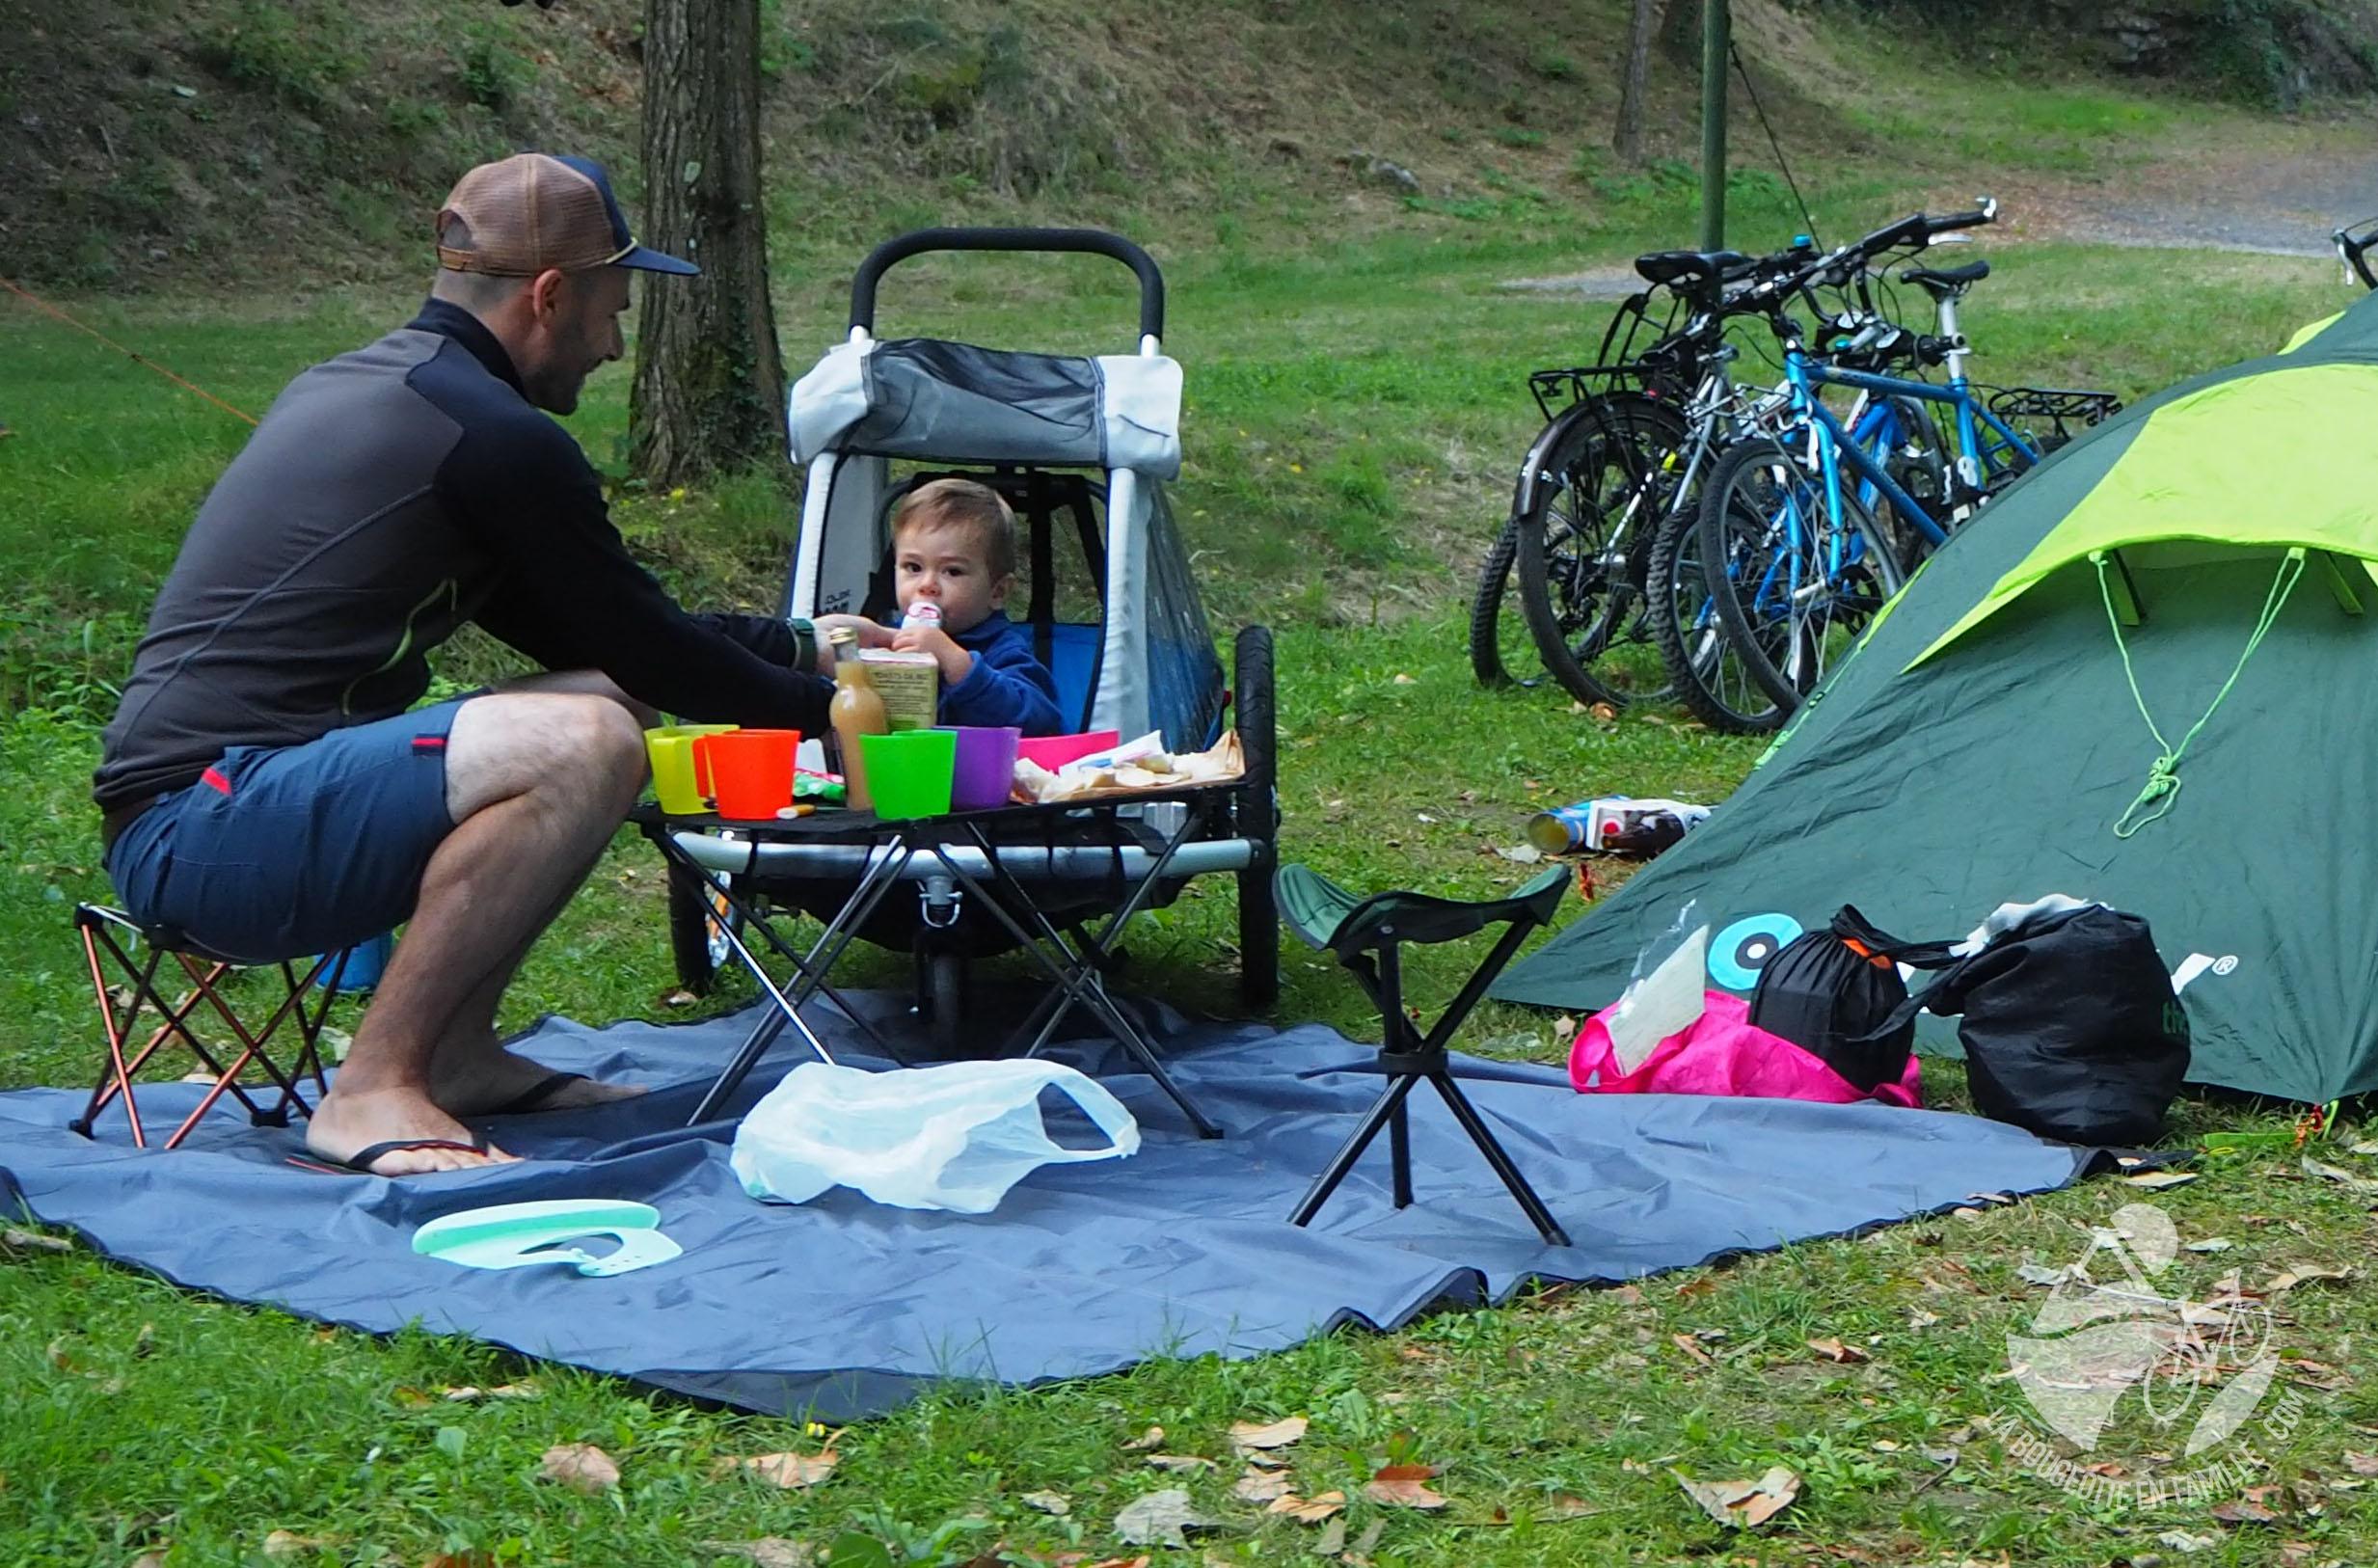 remorque velo bébé camping